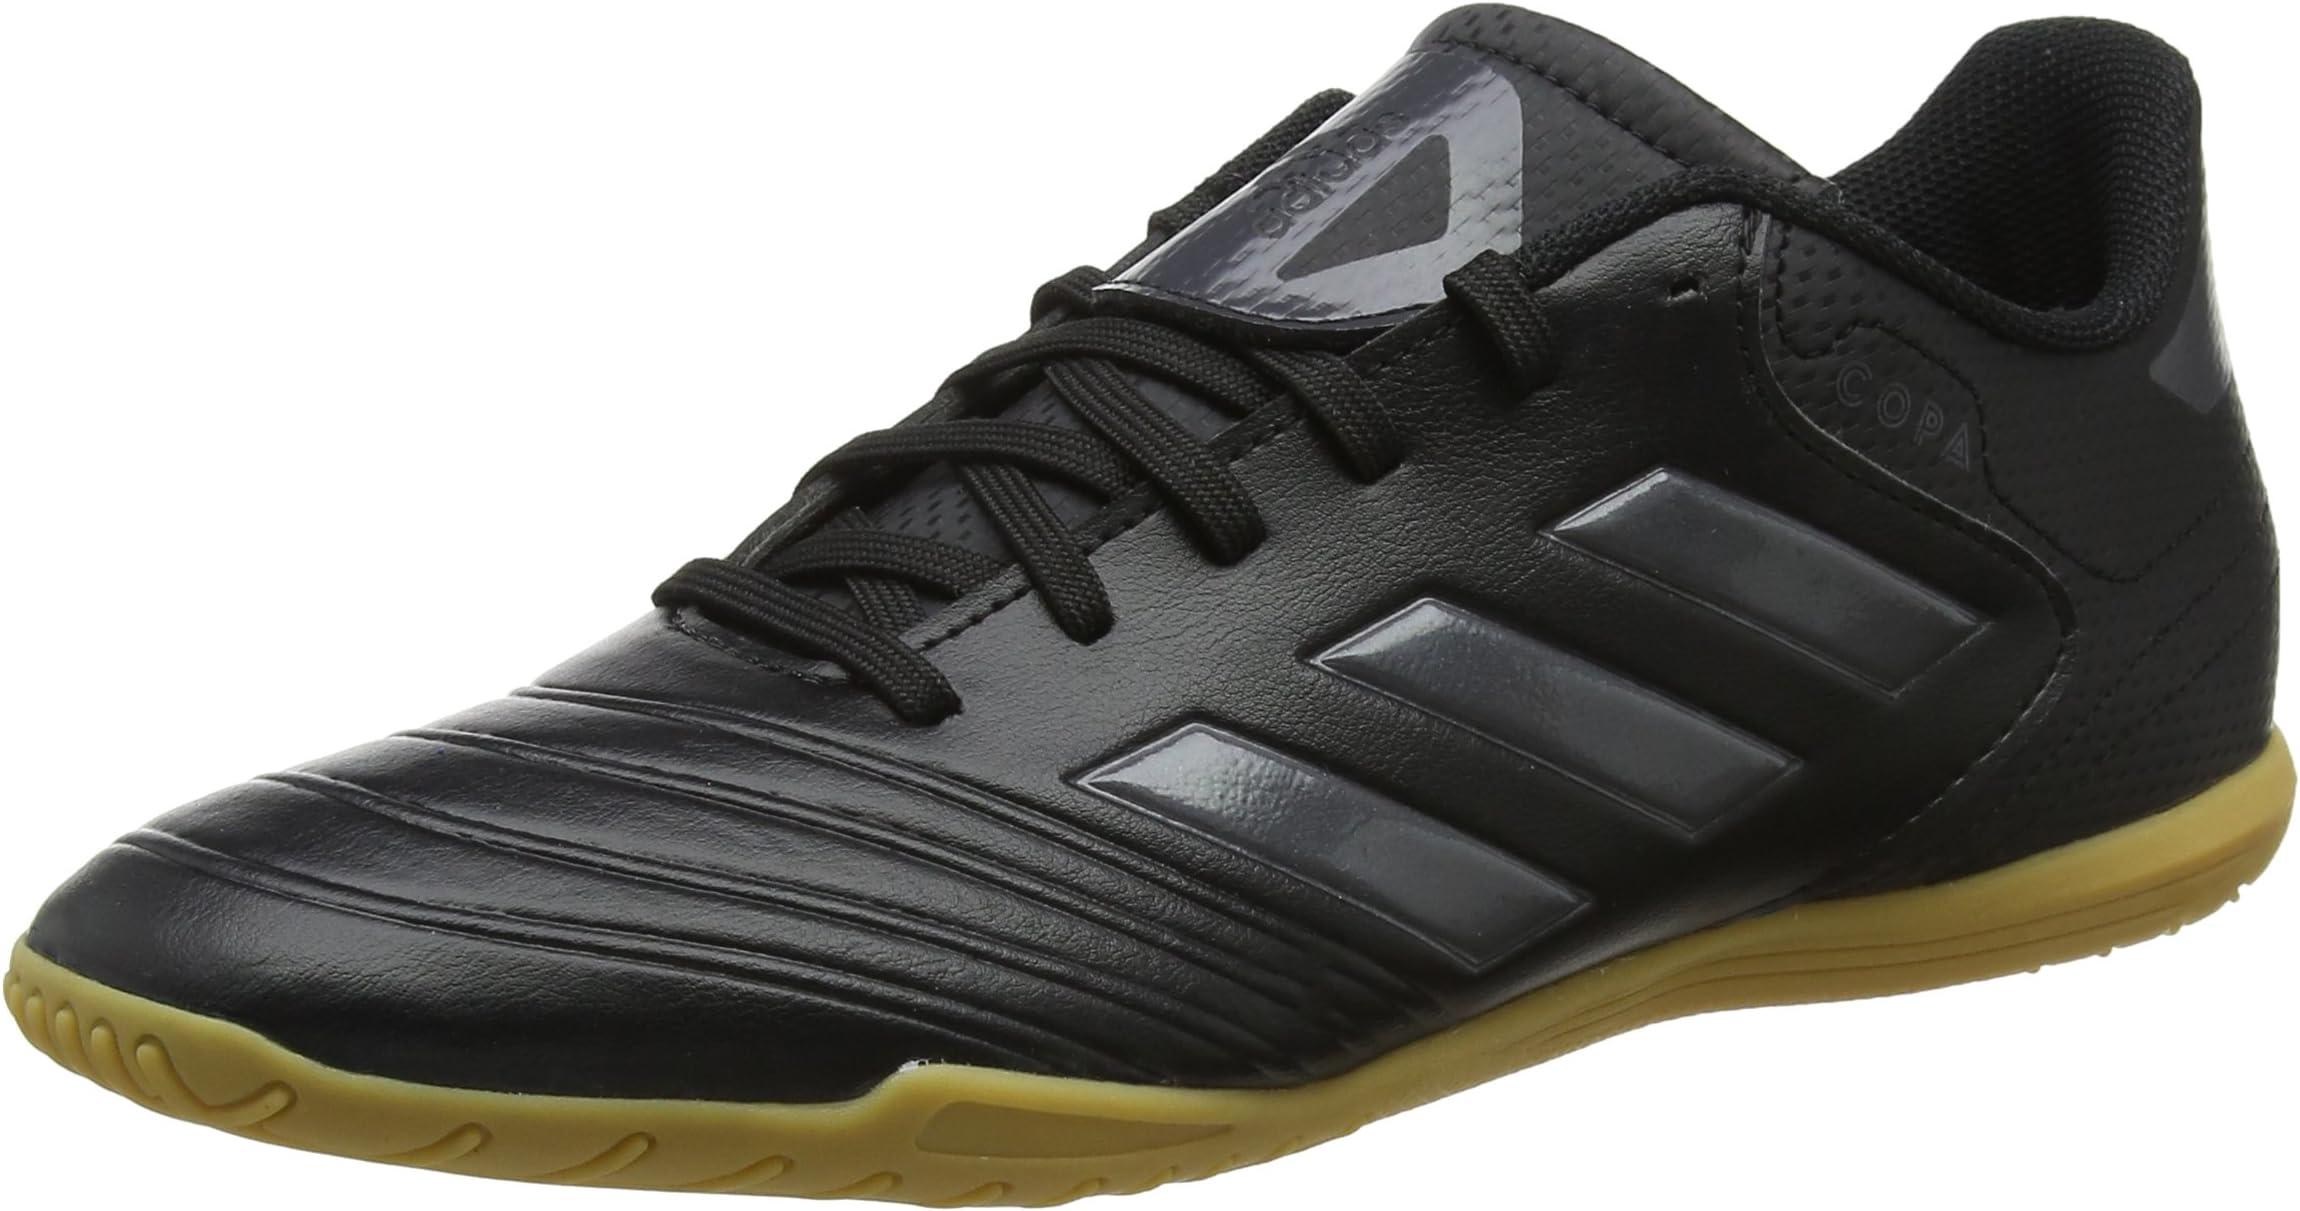 chaussures futsal adidas pas cher